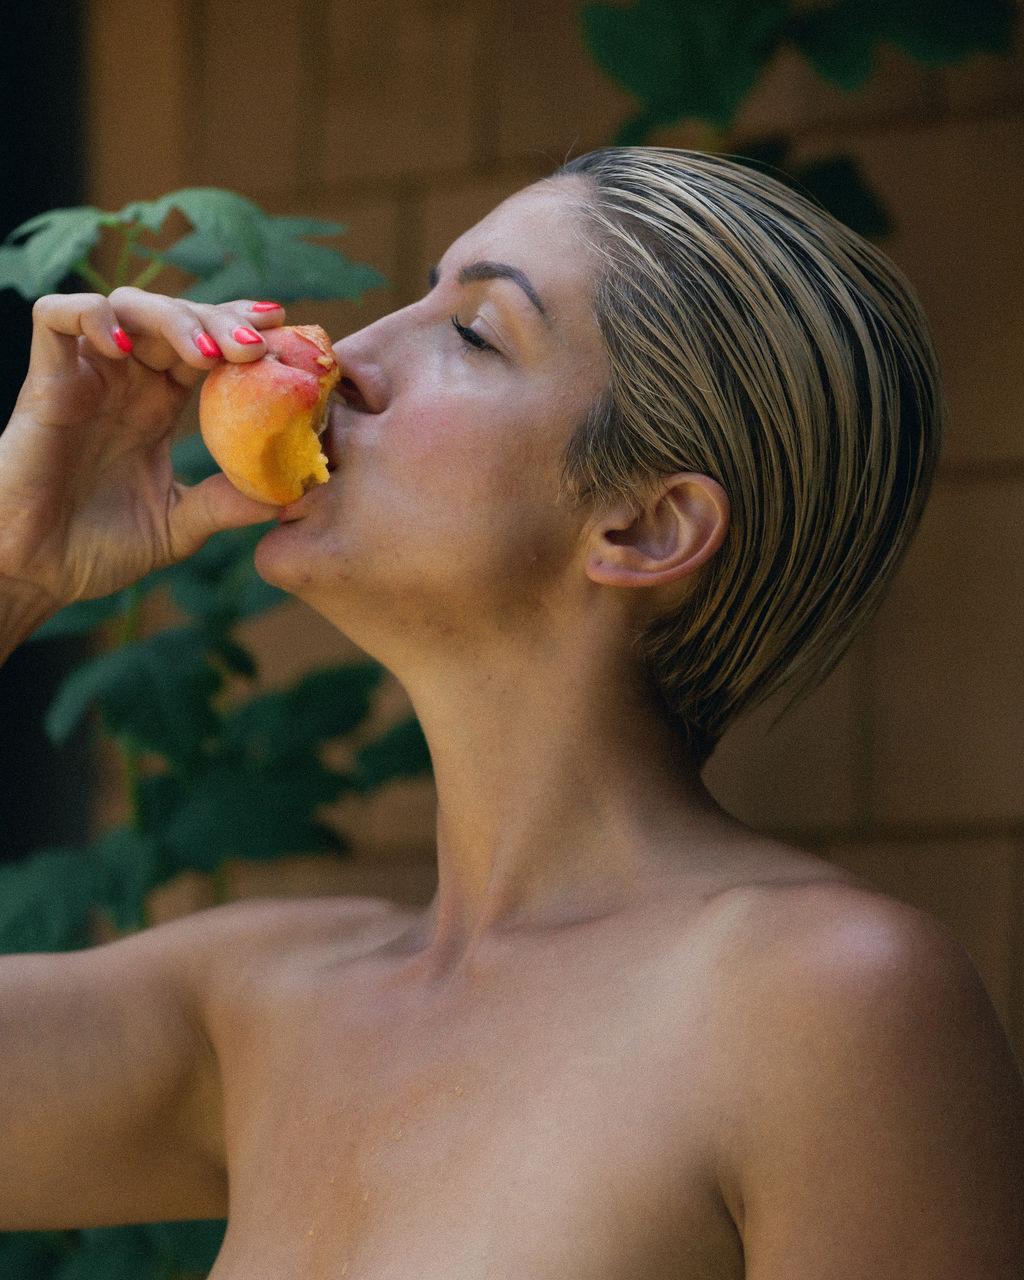 woman eating peach image